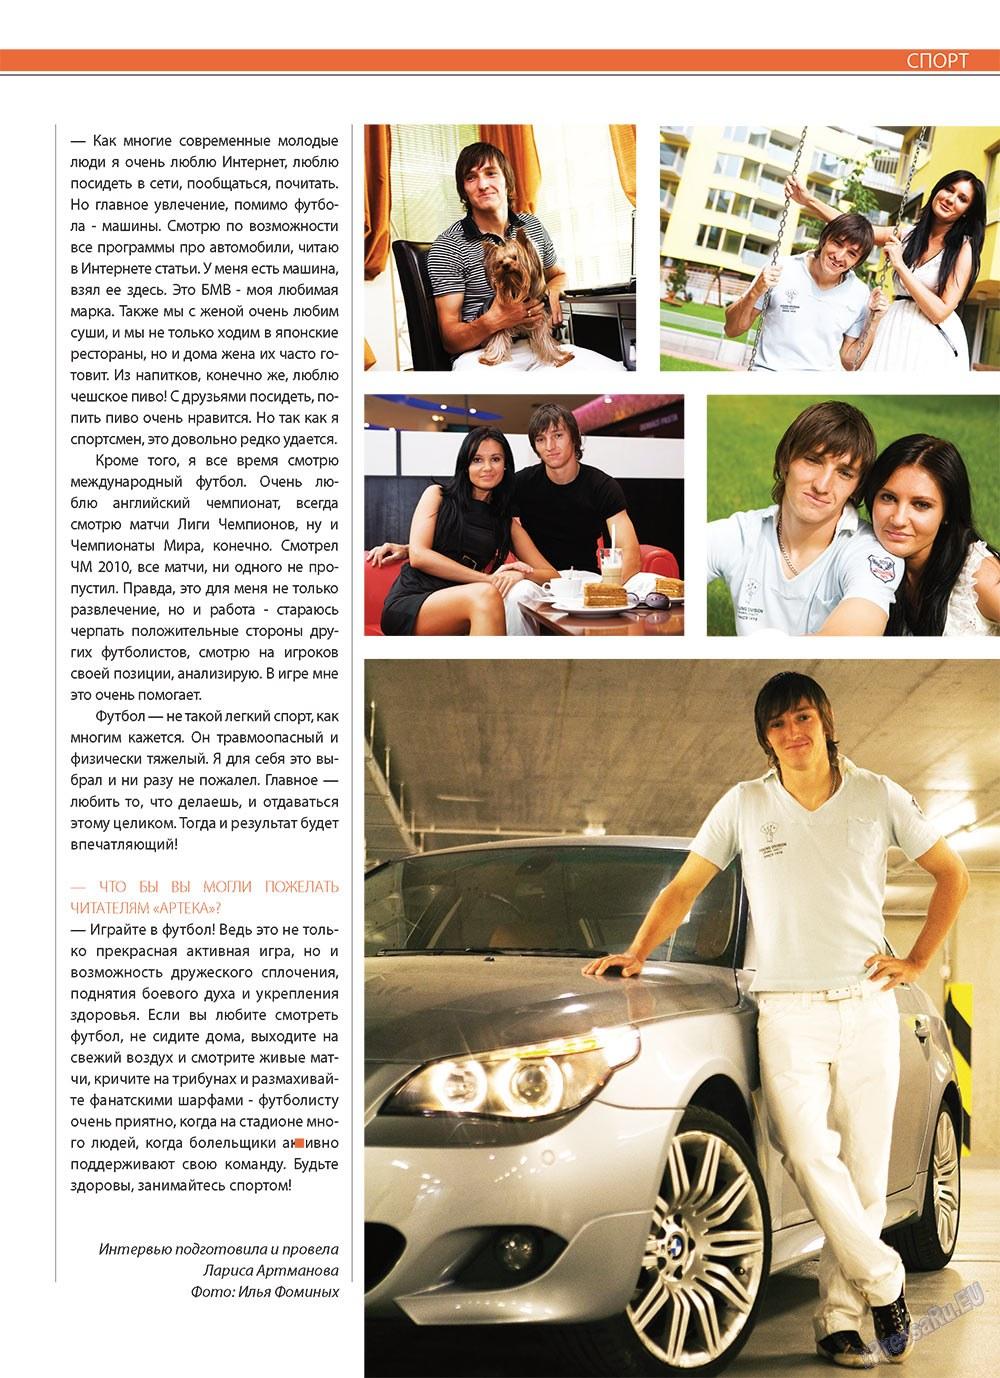 Артек (журнал). 2010 год, номер 4, стр. 31